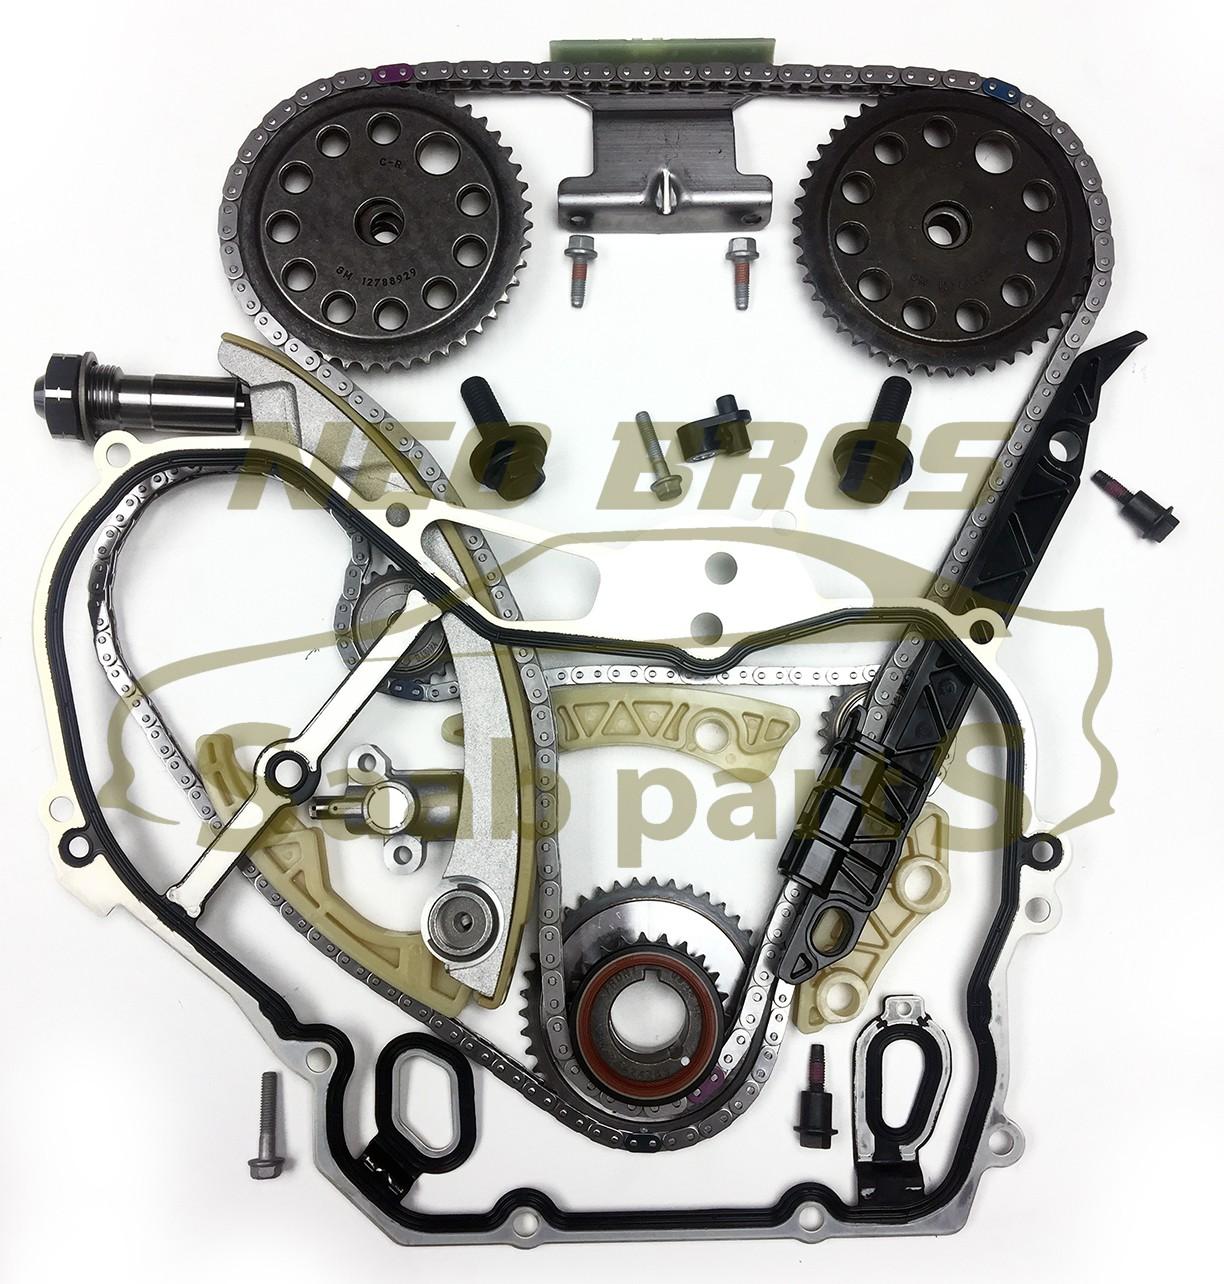 Turbo Kit Opel Vectra: VAUXHALL VECTRA C SIGNUM 2.0T Z20NET FULL ENGINE TIMING